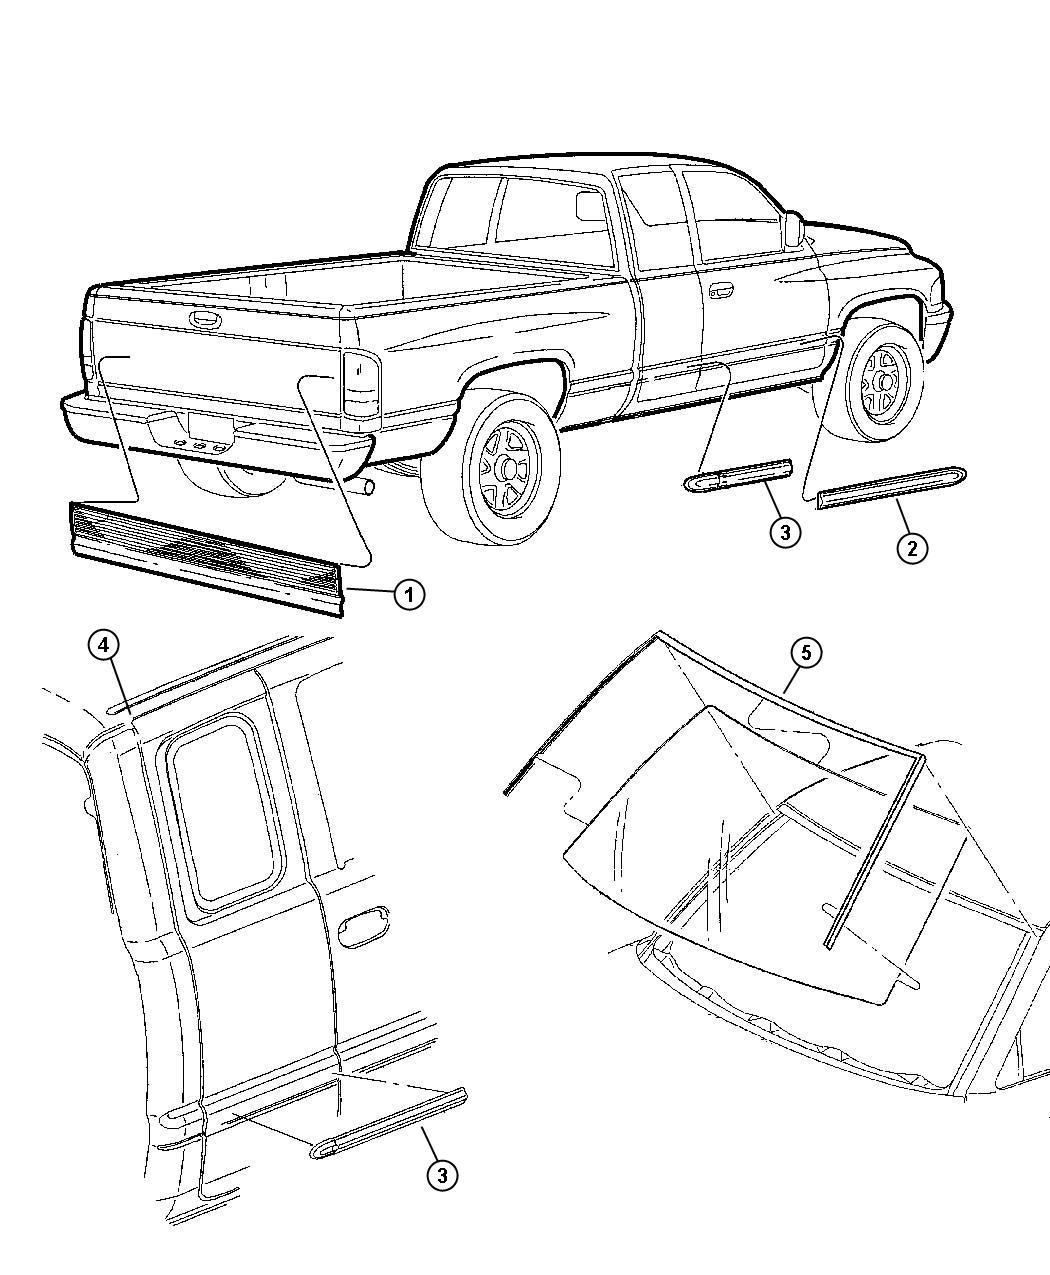 2001 Dodge Ram 1500 Molding. Left. Roof quarter joint